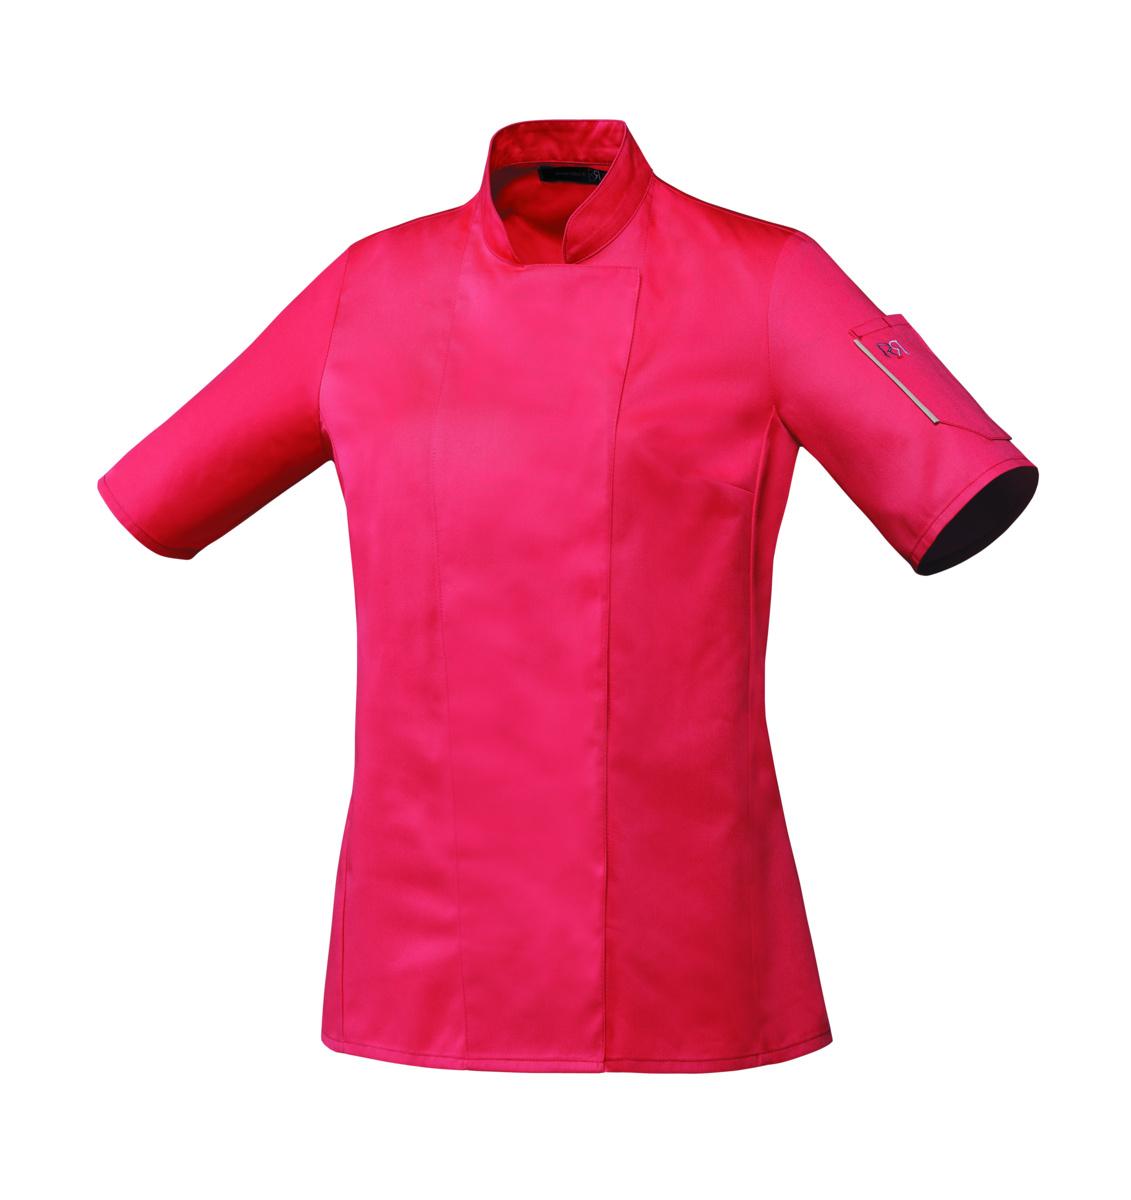 Veste femme rose taille 6 Unera Robur